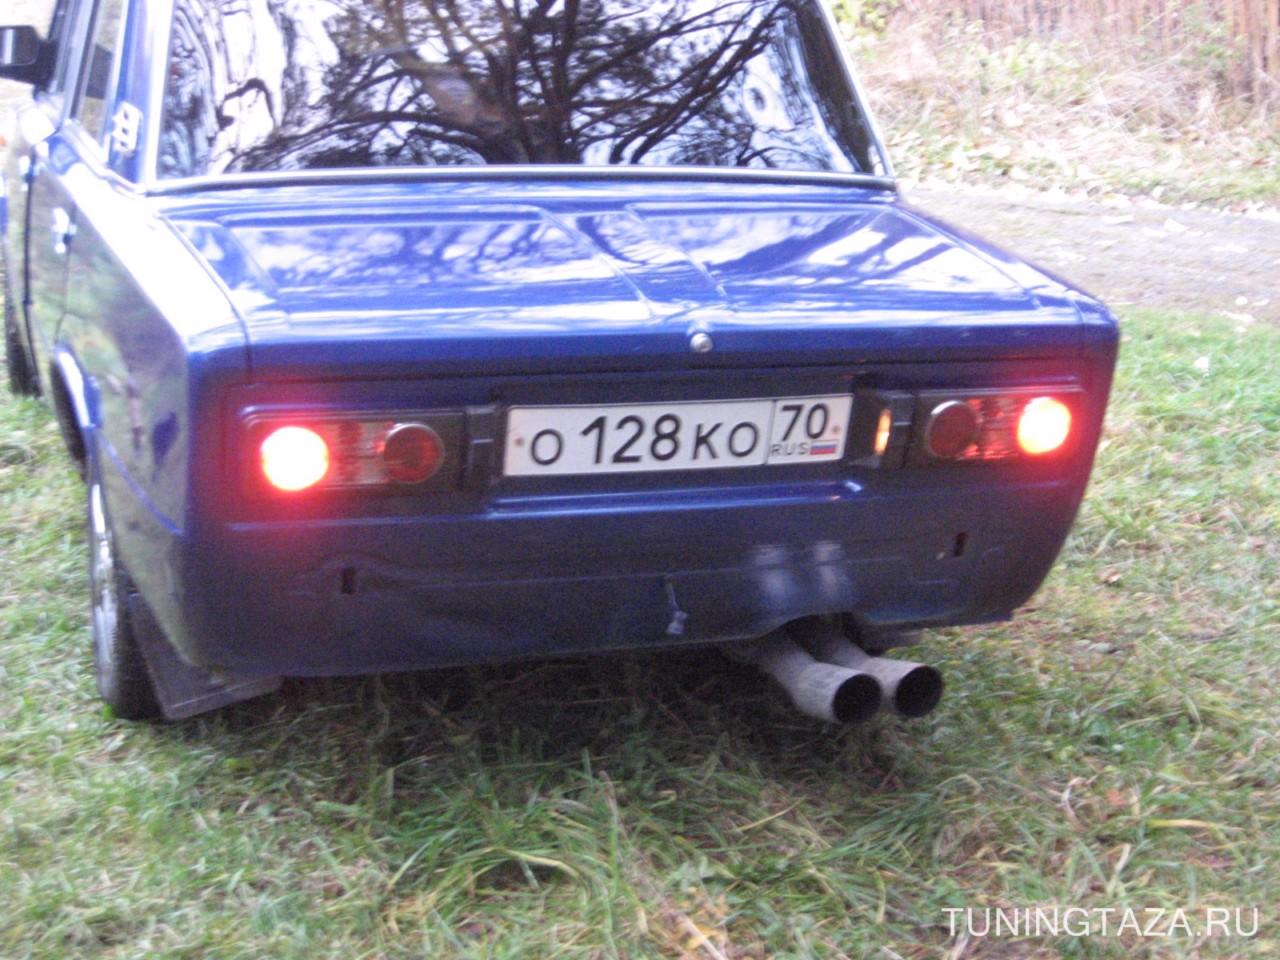 ��� ��������� �������� ������ prosport �� 21099